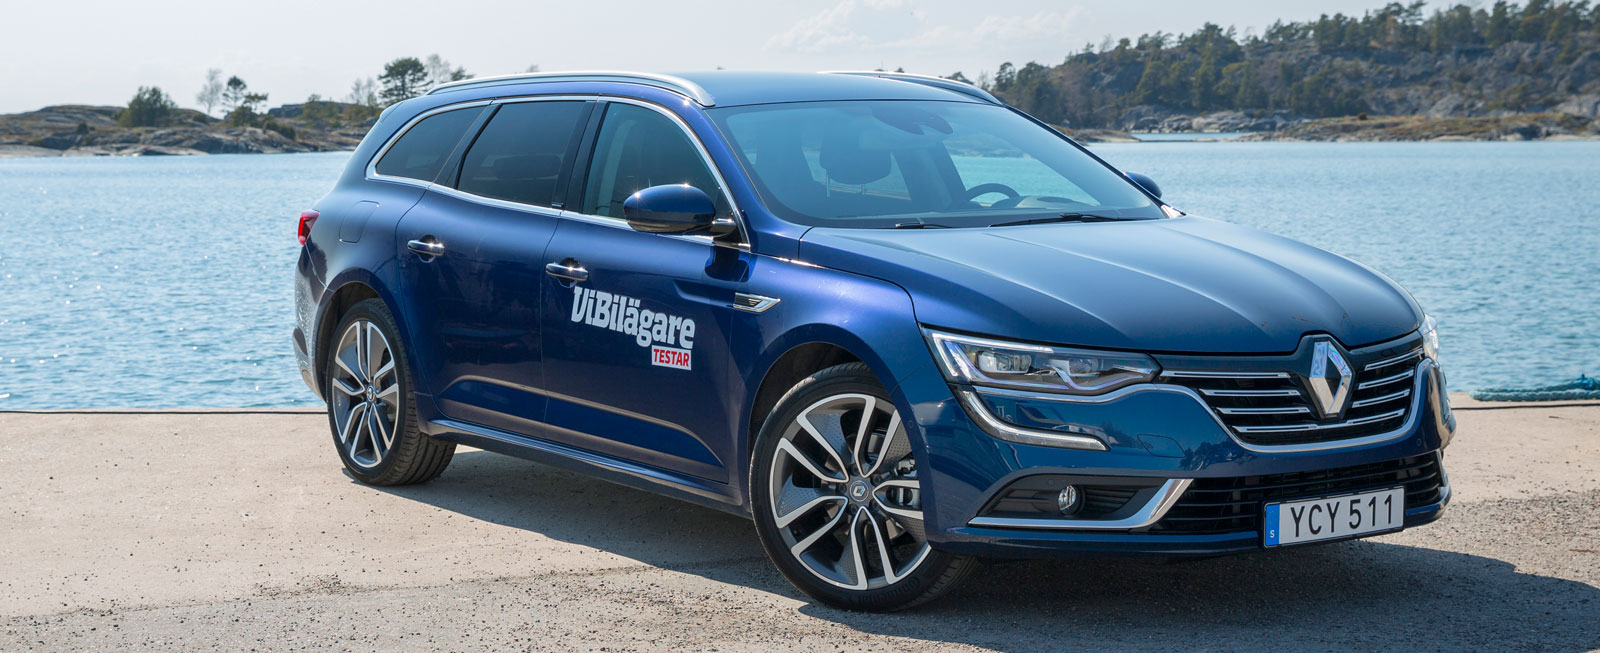 Renault Talisman Intens DCi 130 edc